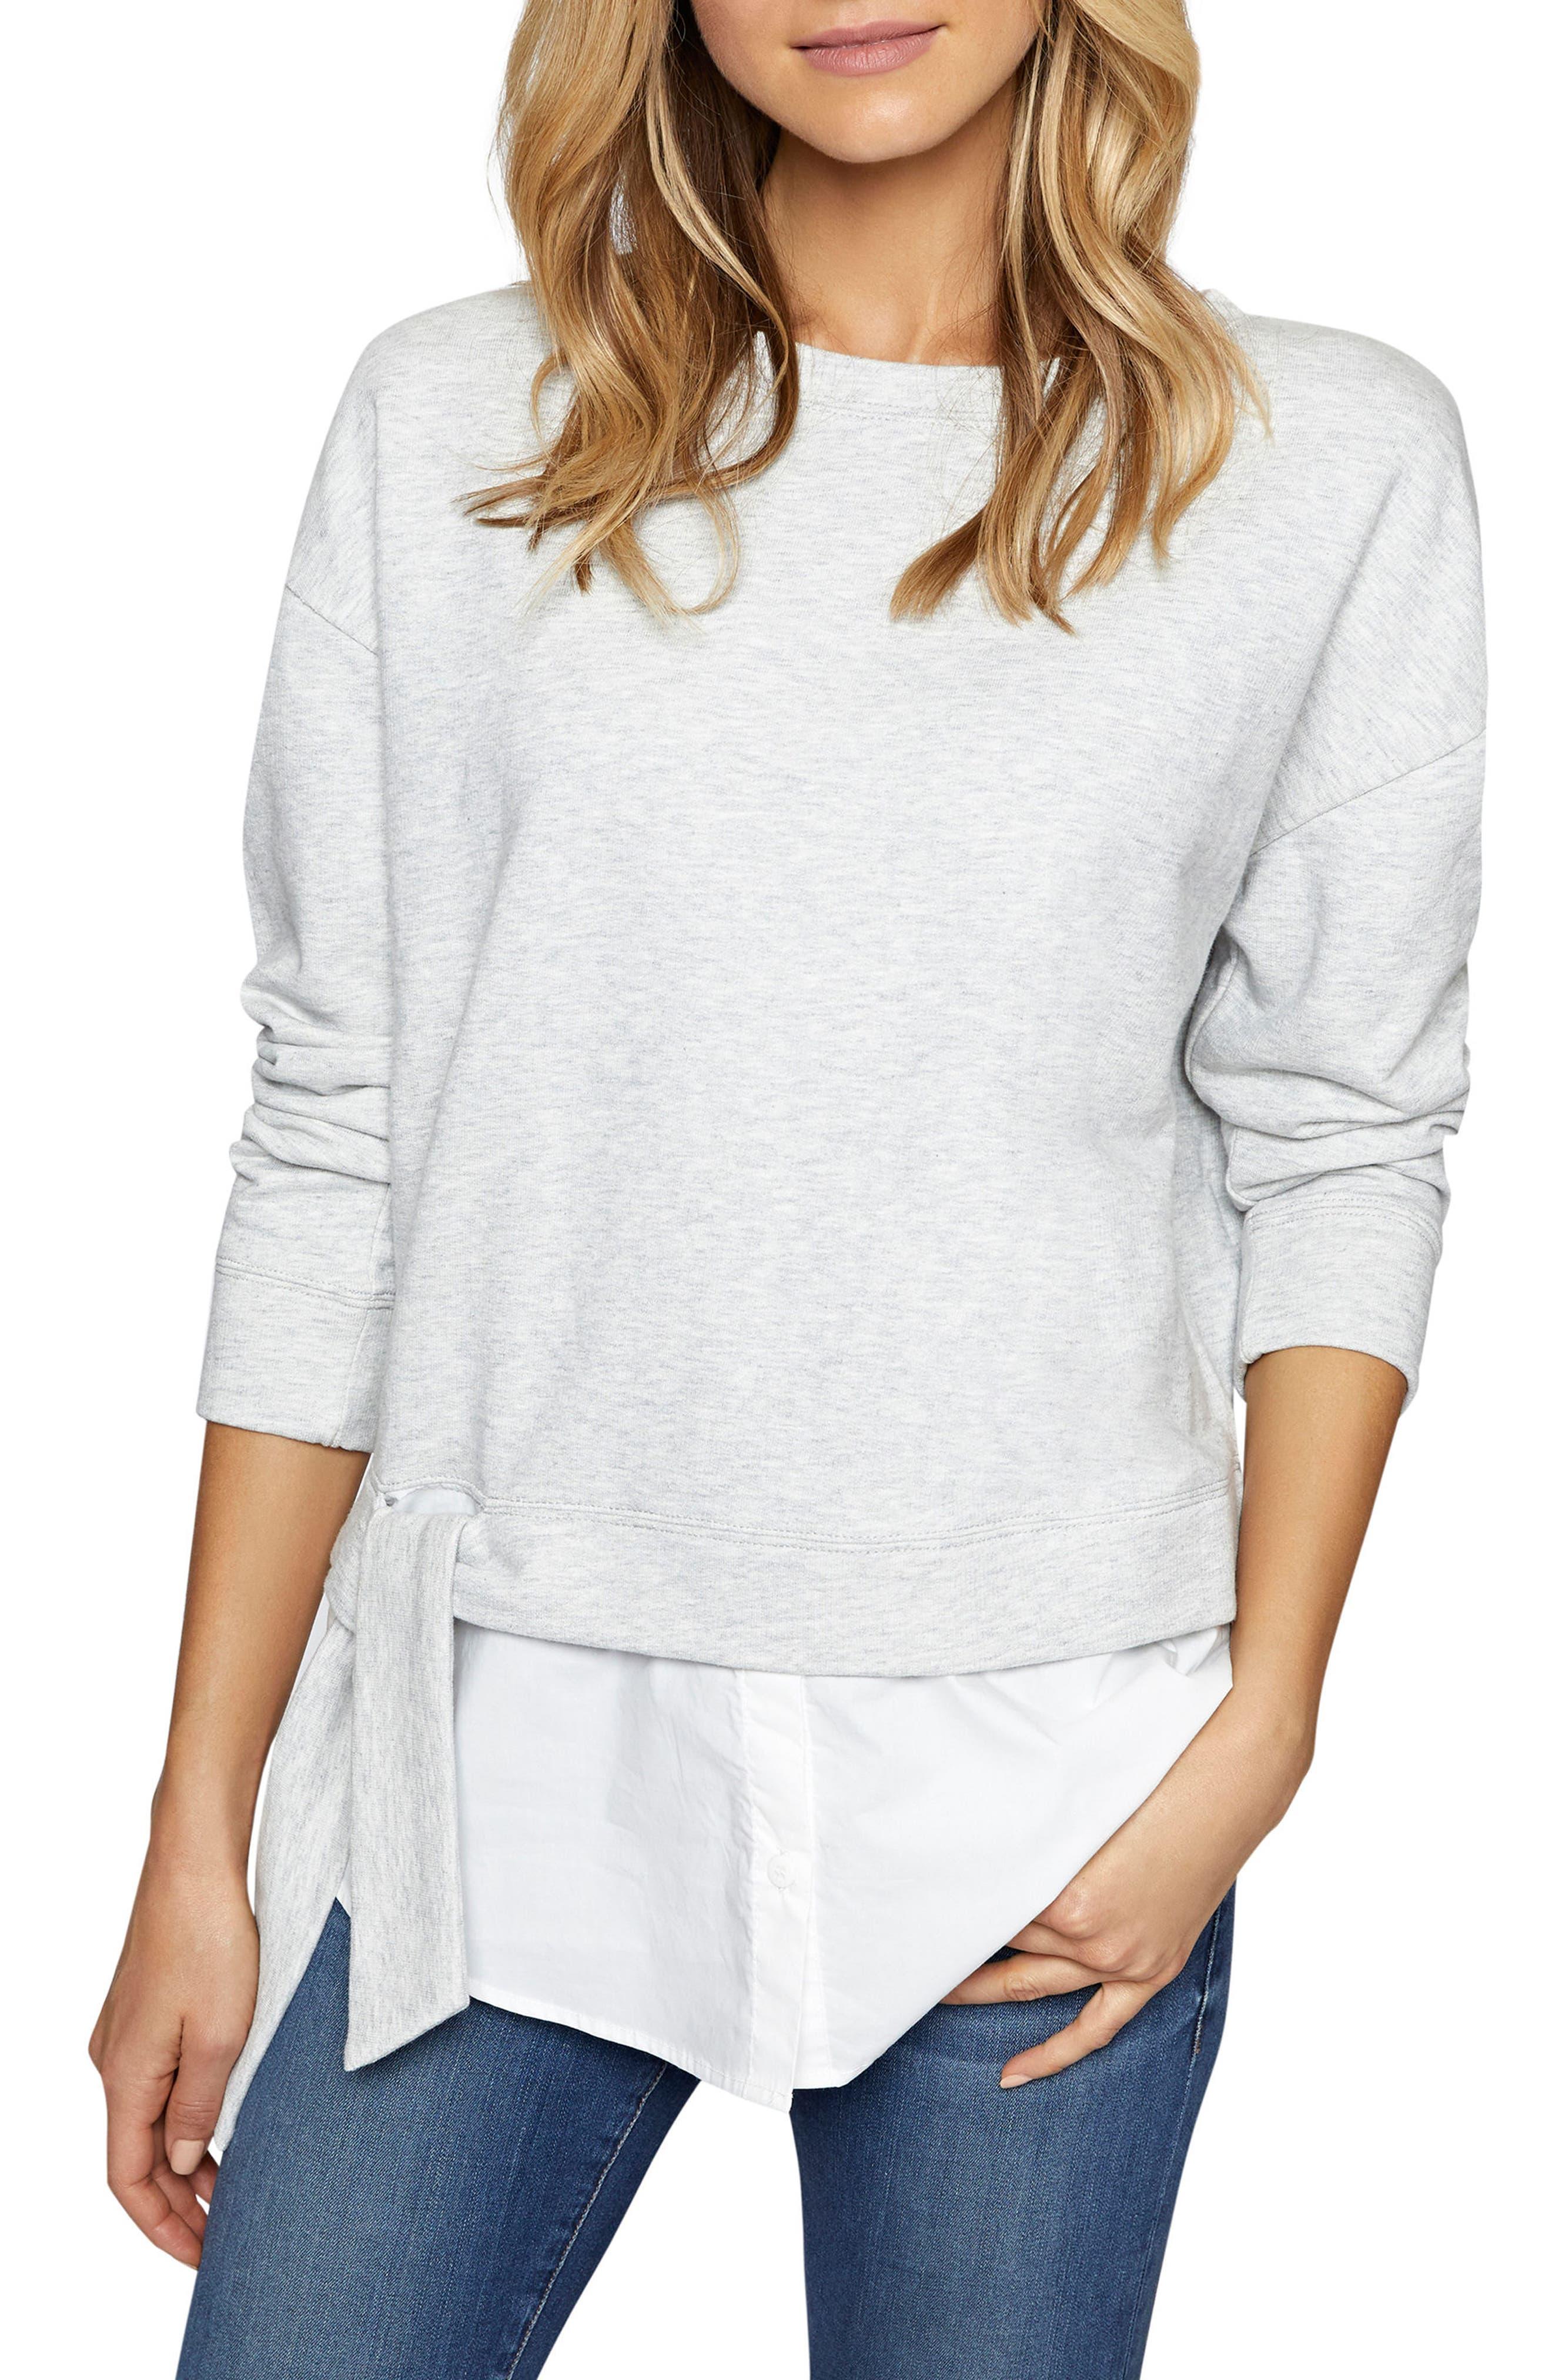 Main Image - Sanctuary Ally Layered Look Sweatshirt